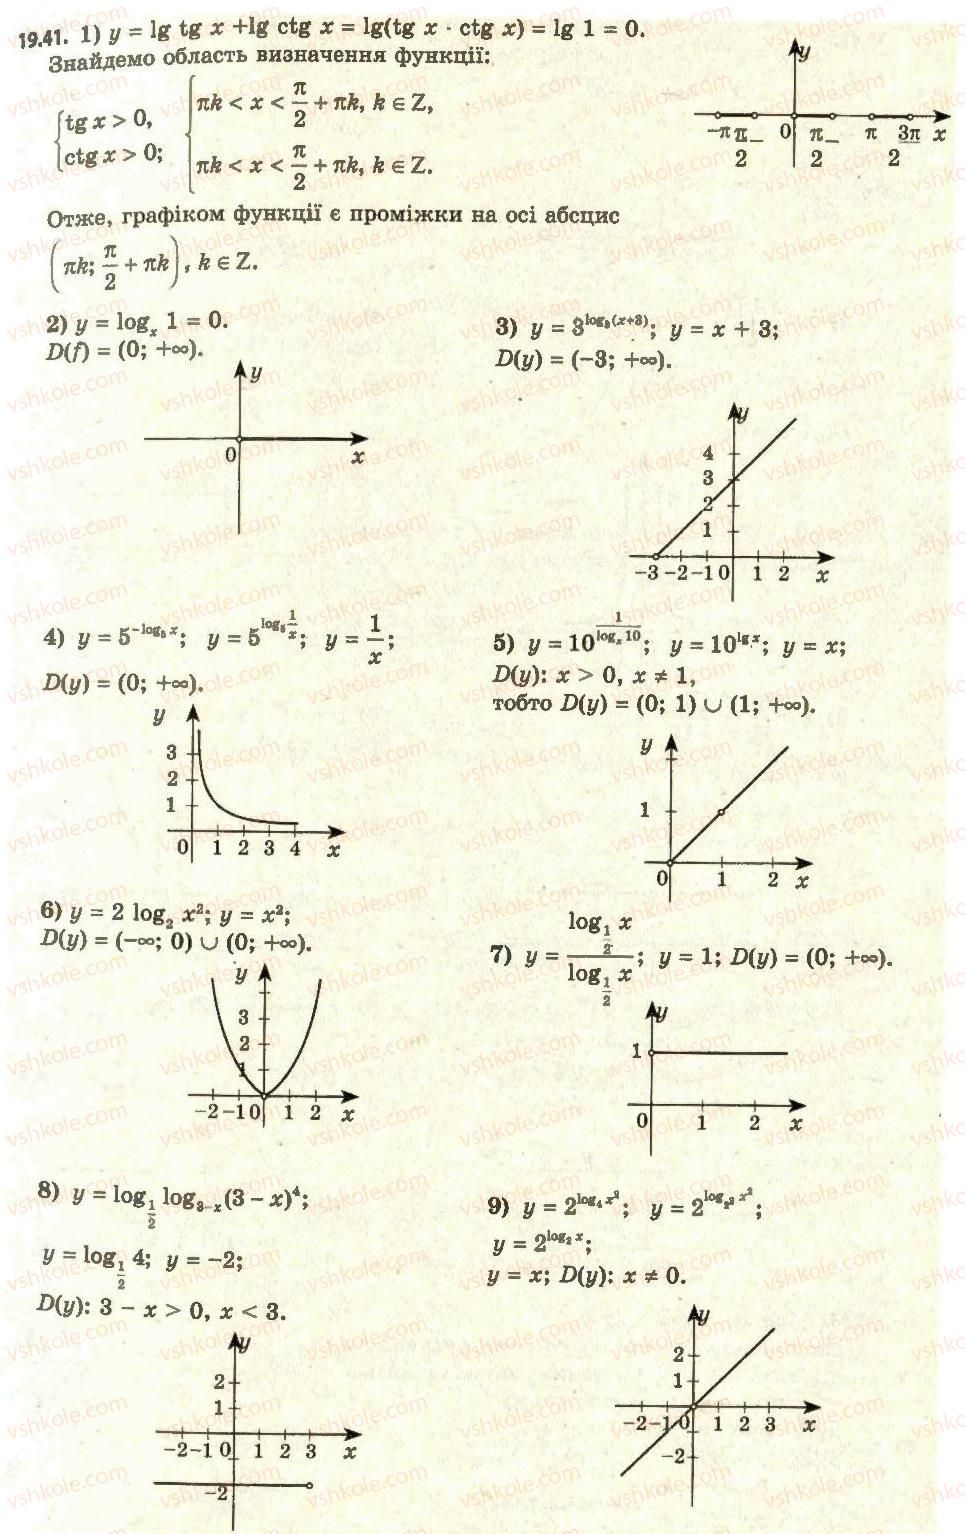 11-algebra-ag-merzlyak-da-nomirovskij-vb-polonskij-ms-yakir-2011-akademichnij-profilnij-rivni--2-pokaznikova-i-logarifmichna-funktsiyi-19-logarifm-i-jogo-vlastivosti-41.jpg